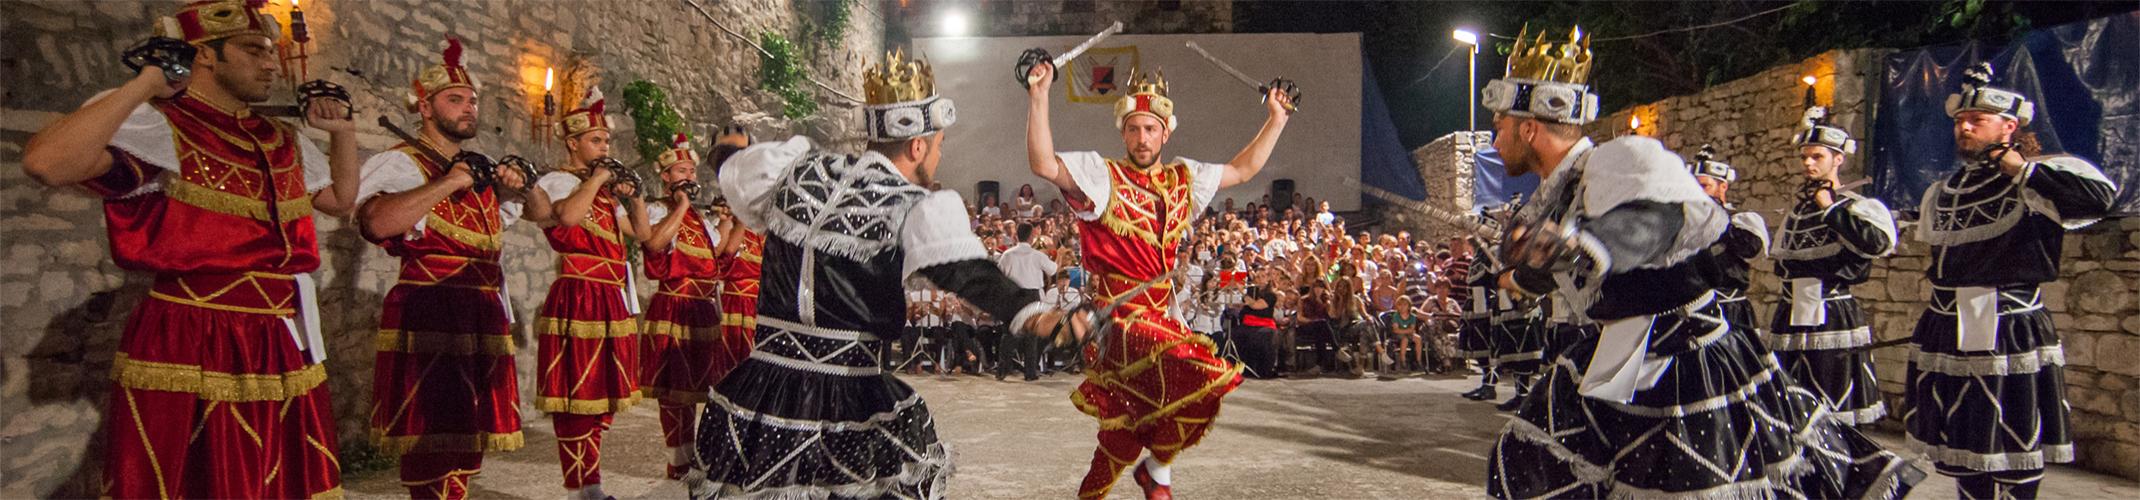 Summer Festivals in Croatia